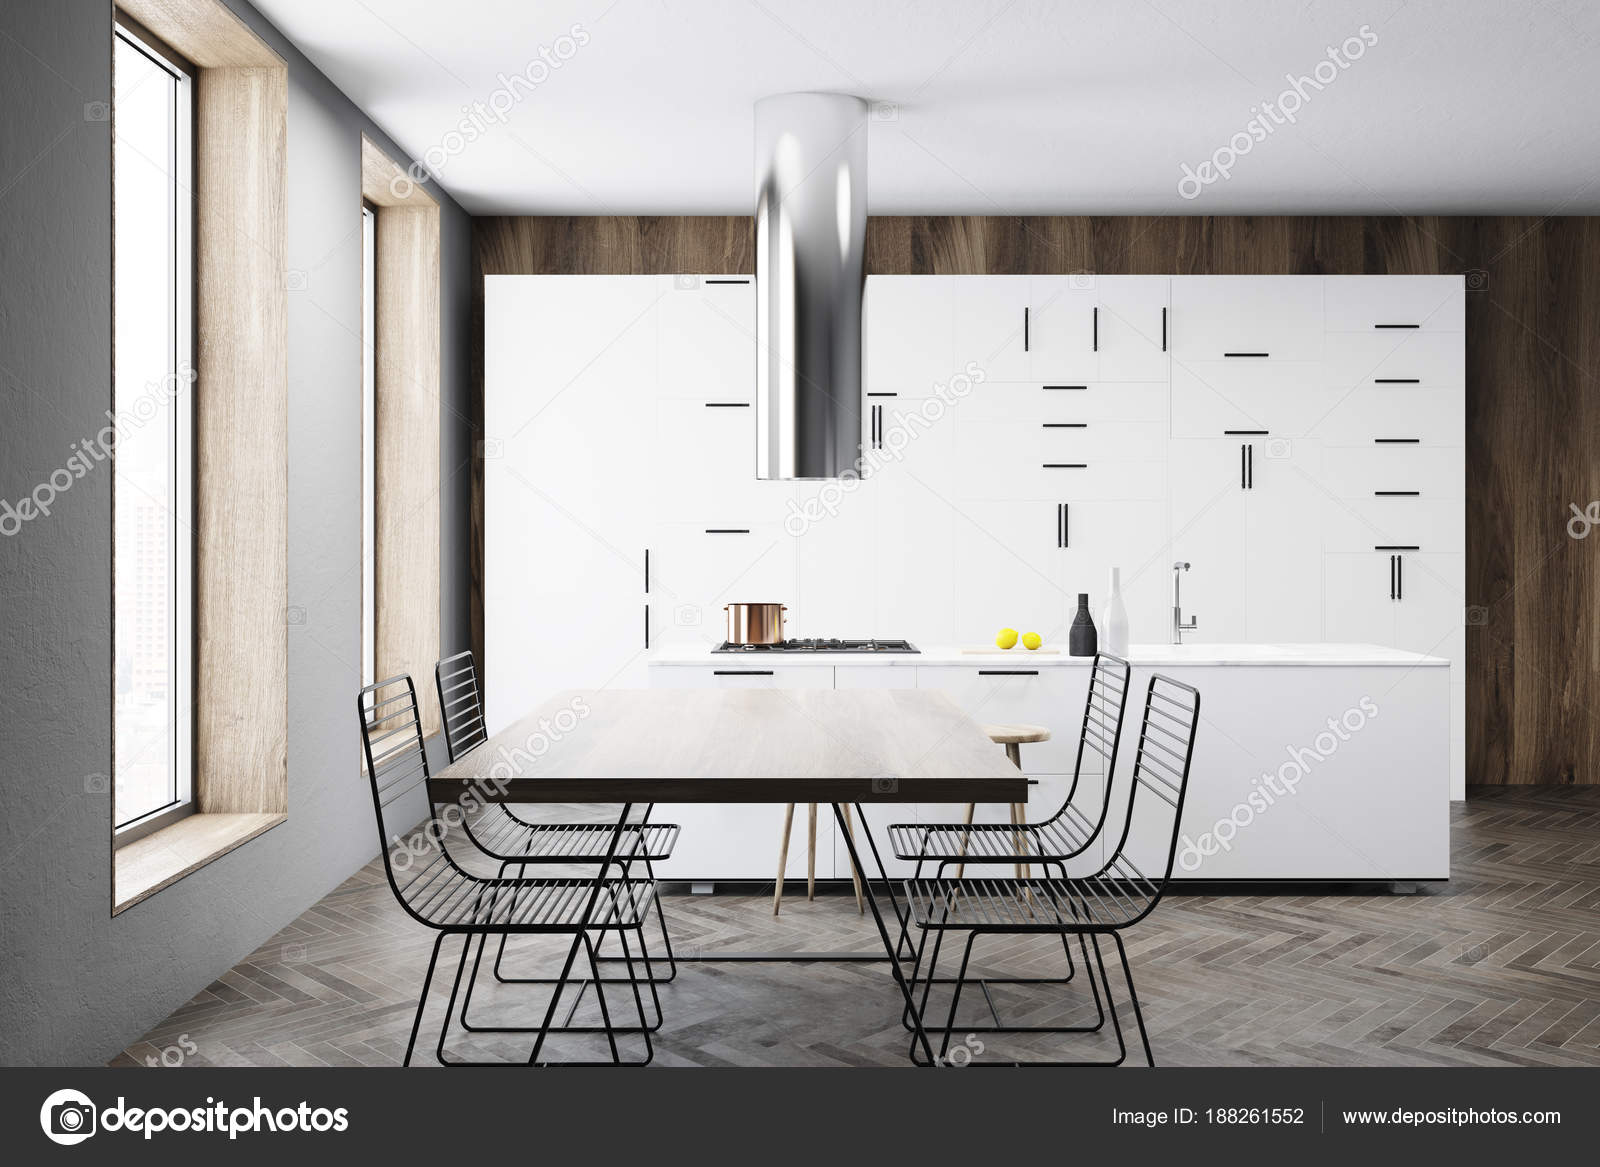 pub kitchen table best wood stain for cabinets 白色厨房内饰 酒吧和桌子 图库照片 c denisismagilov 188261552